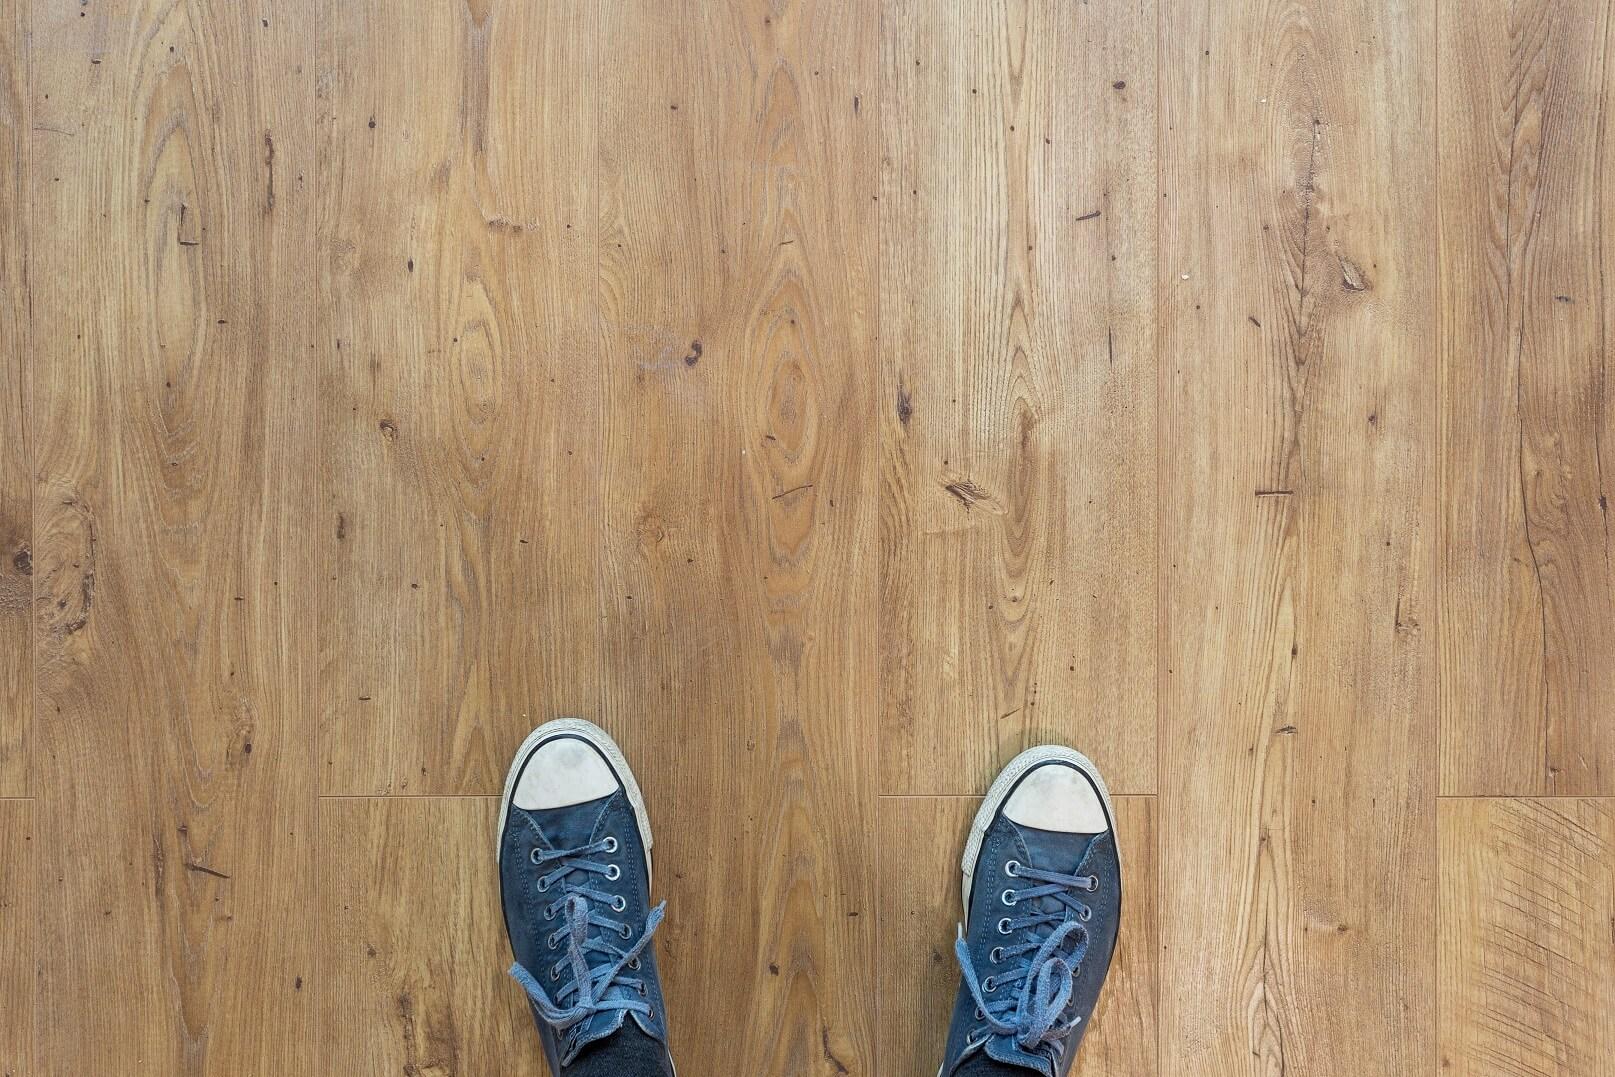 pozor na nohy